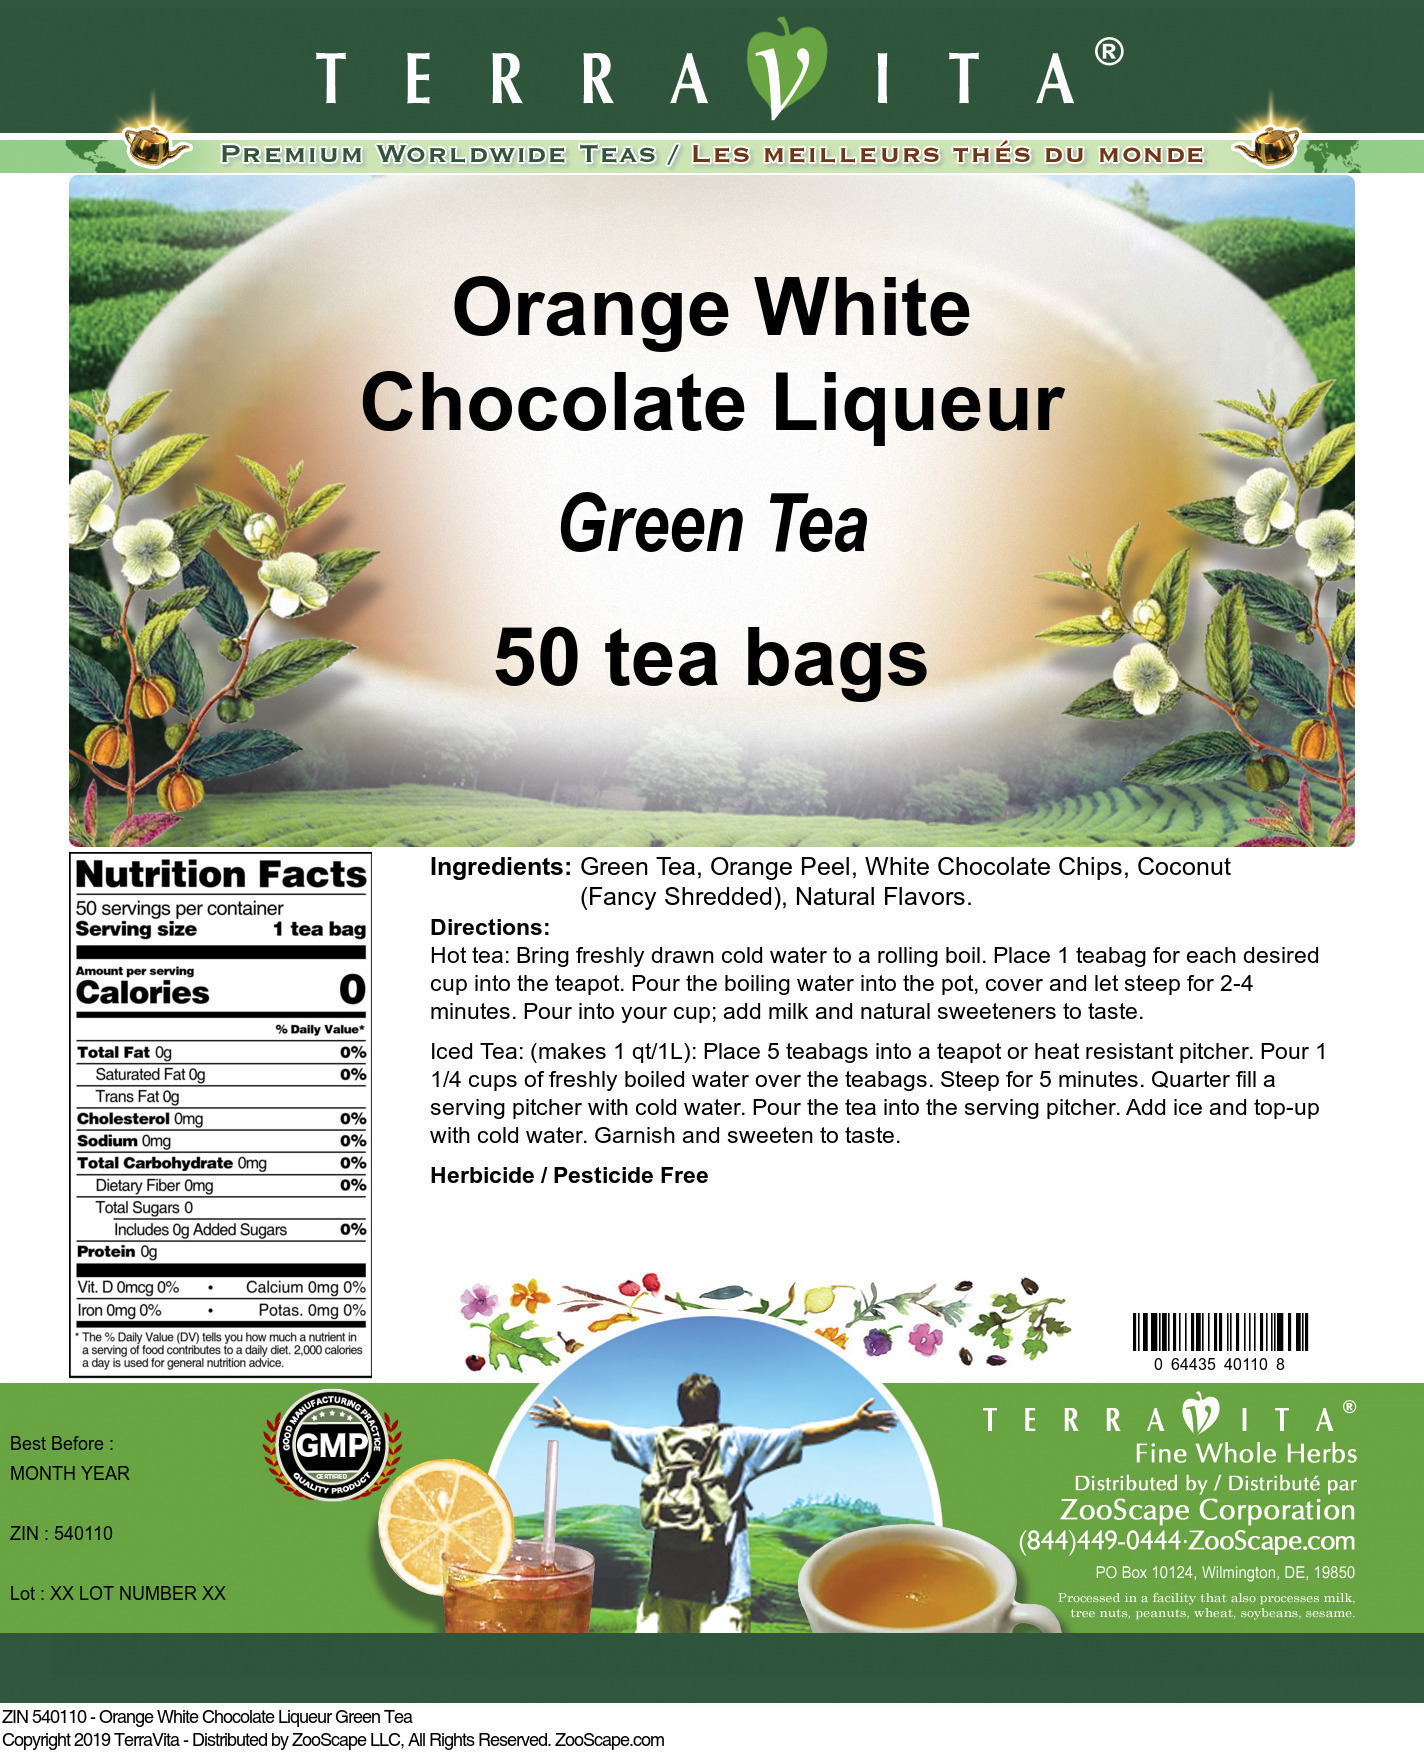 Orange White Chocolate Liqueur Green Tea